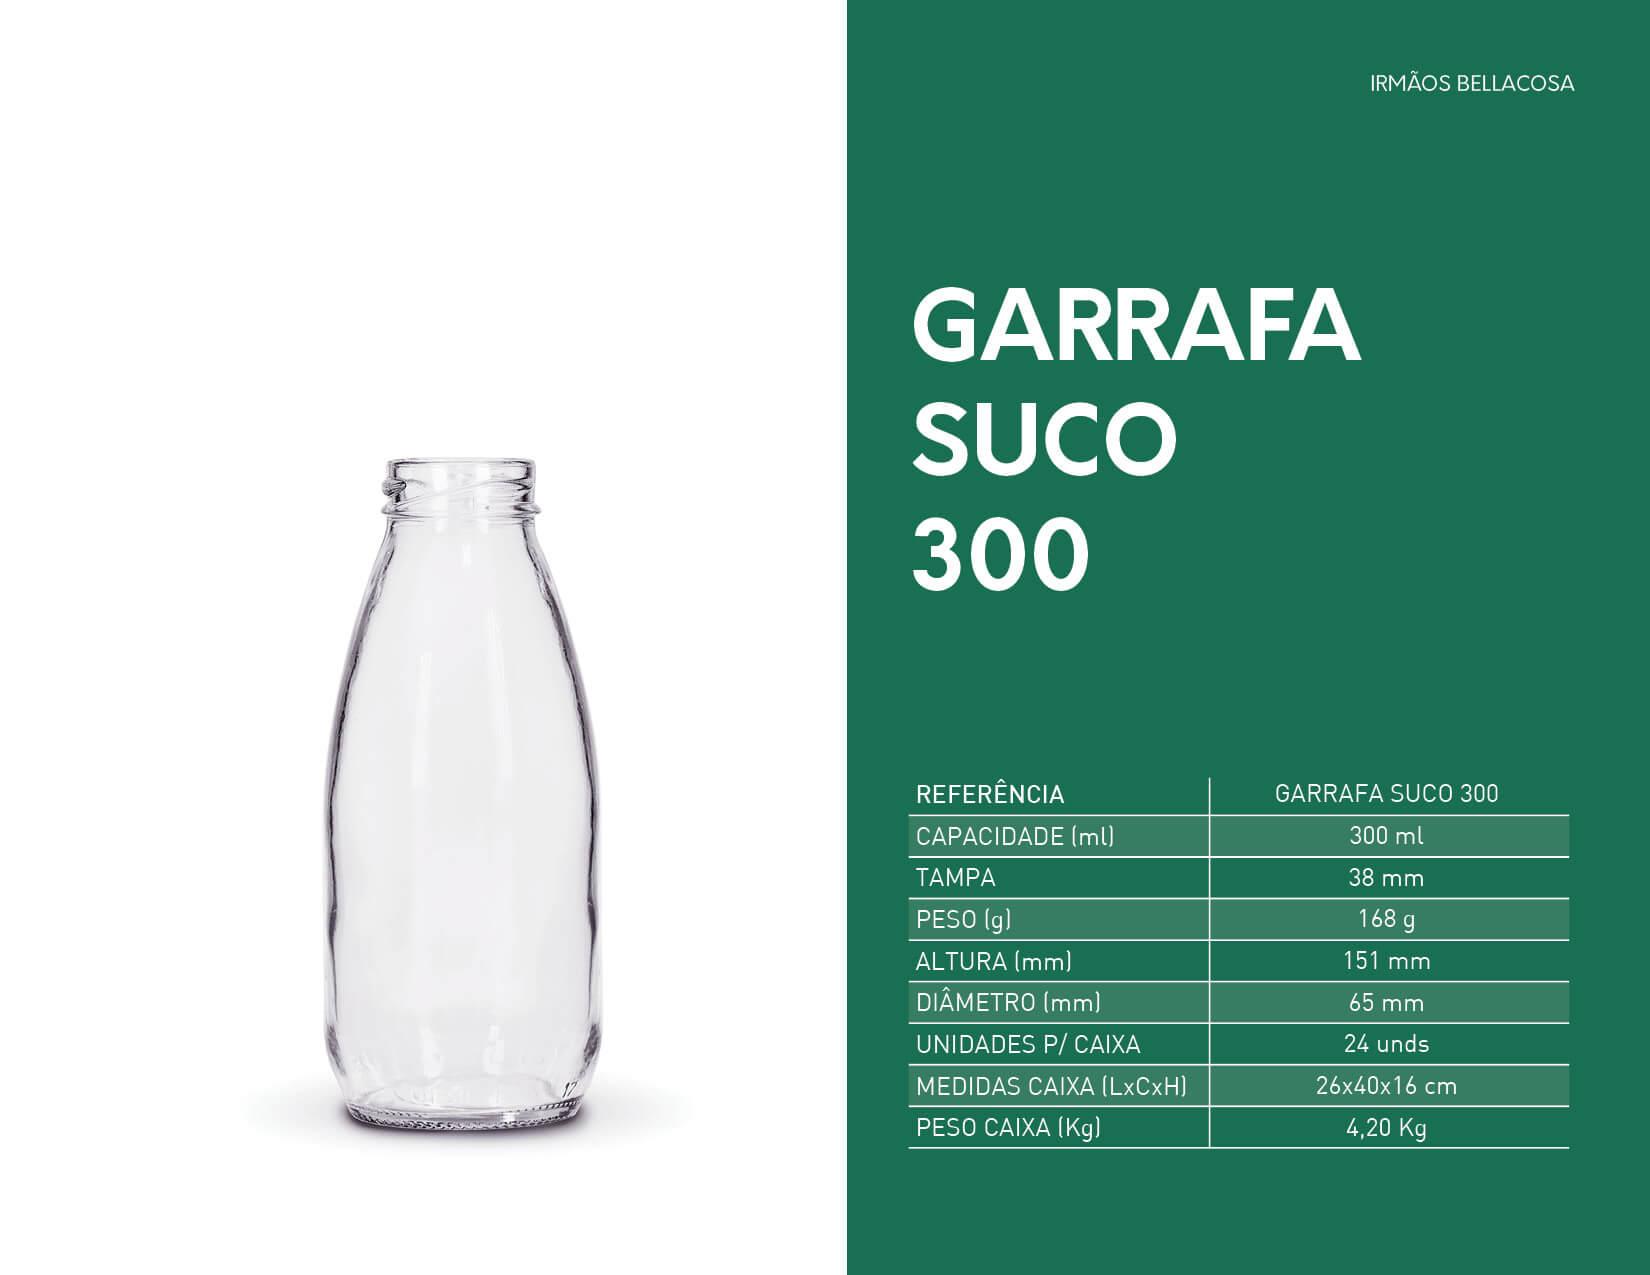 034-Garrafa-suco-300-irmaos-bellacosa-embalagens-de-vidro